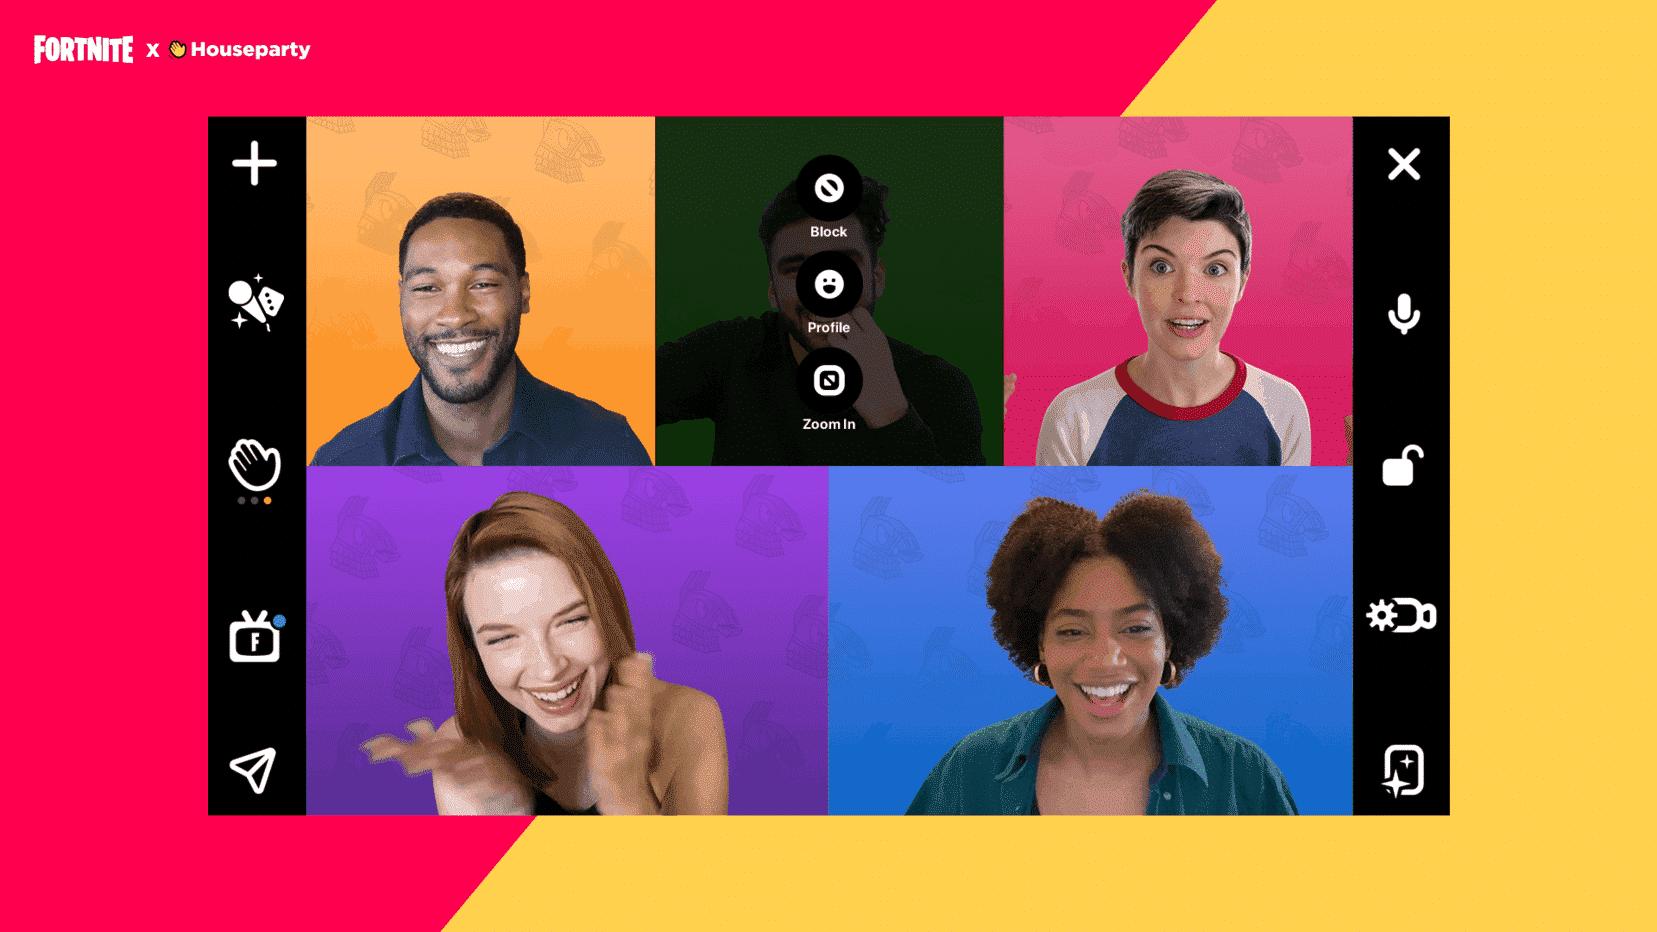 fortnite chat video Housepaty